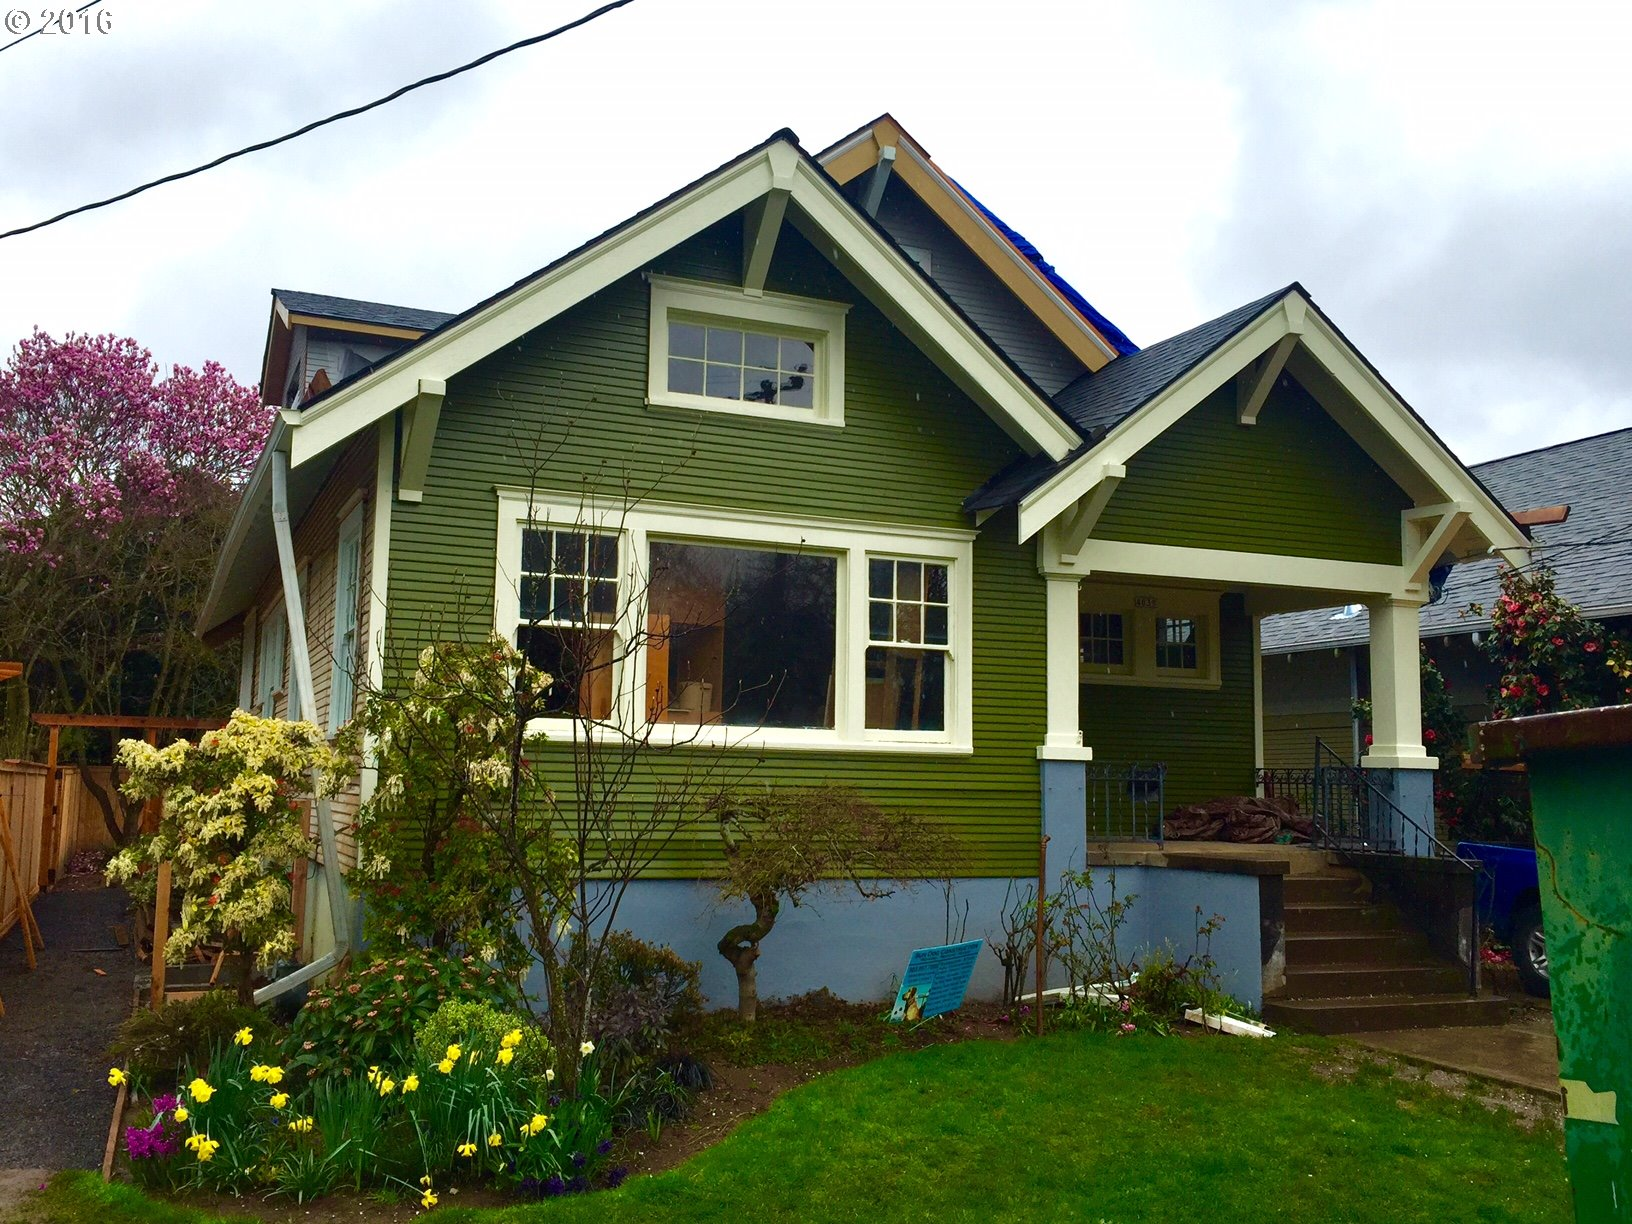 4039 SE MADISON ST, Portland OR 97214